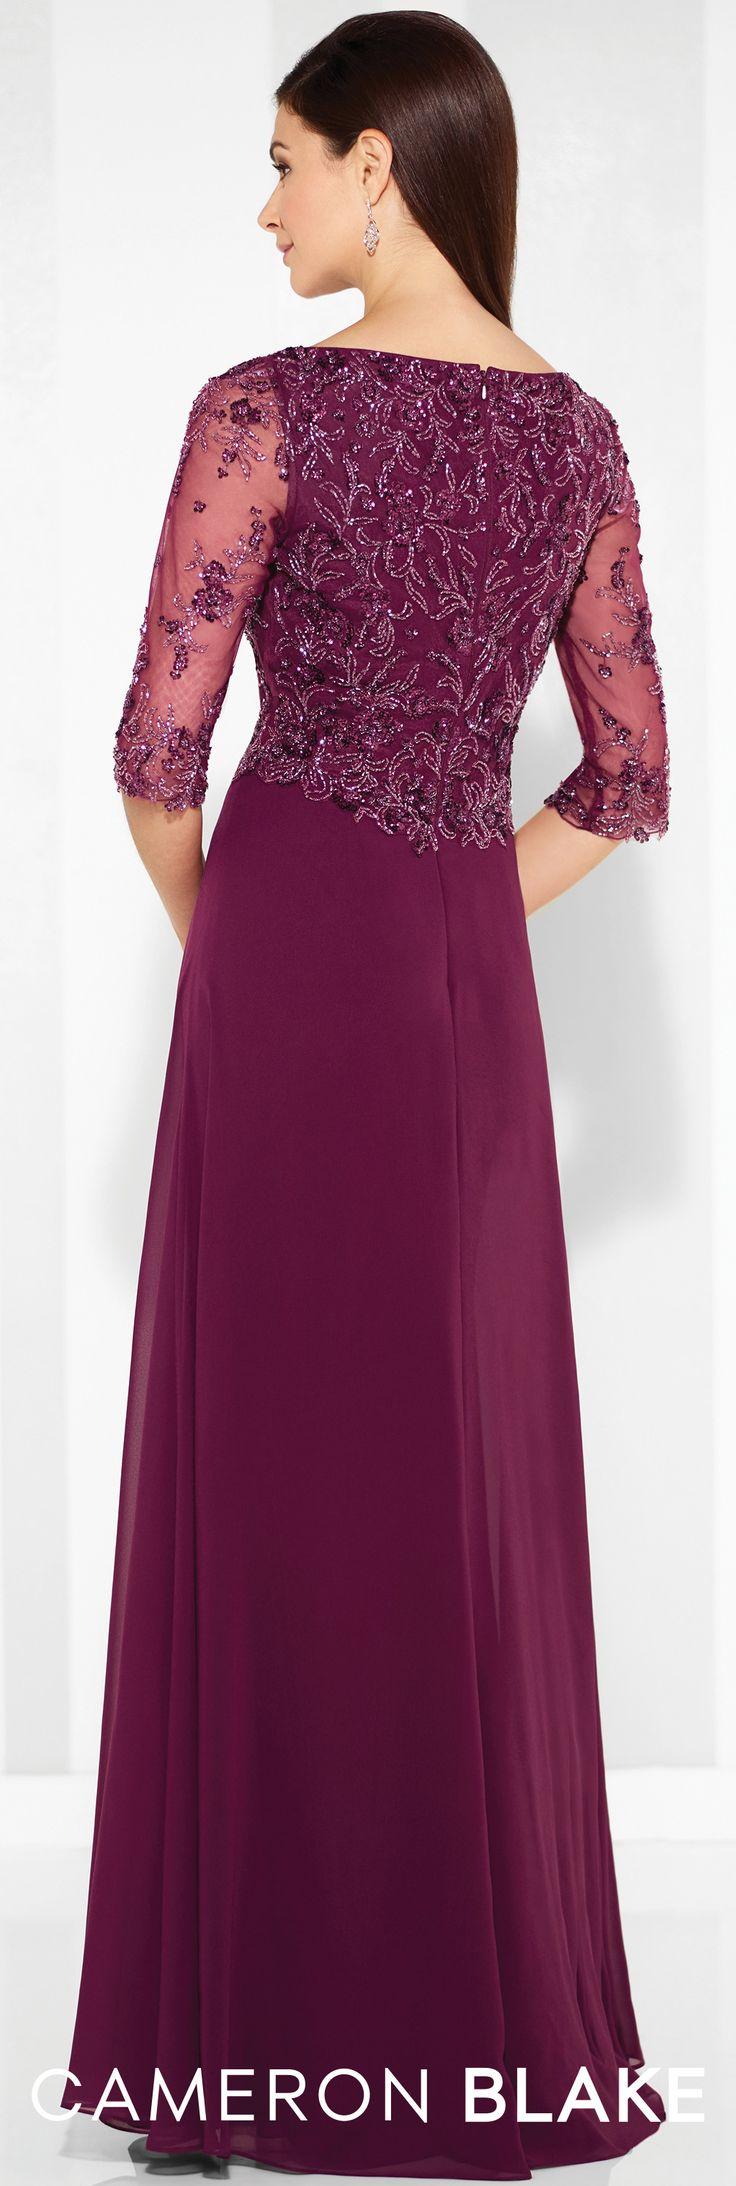 best evening dresses images on pinterest bridesmaid dress